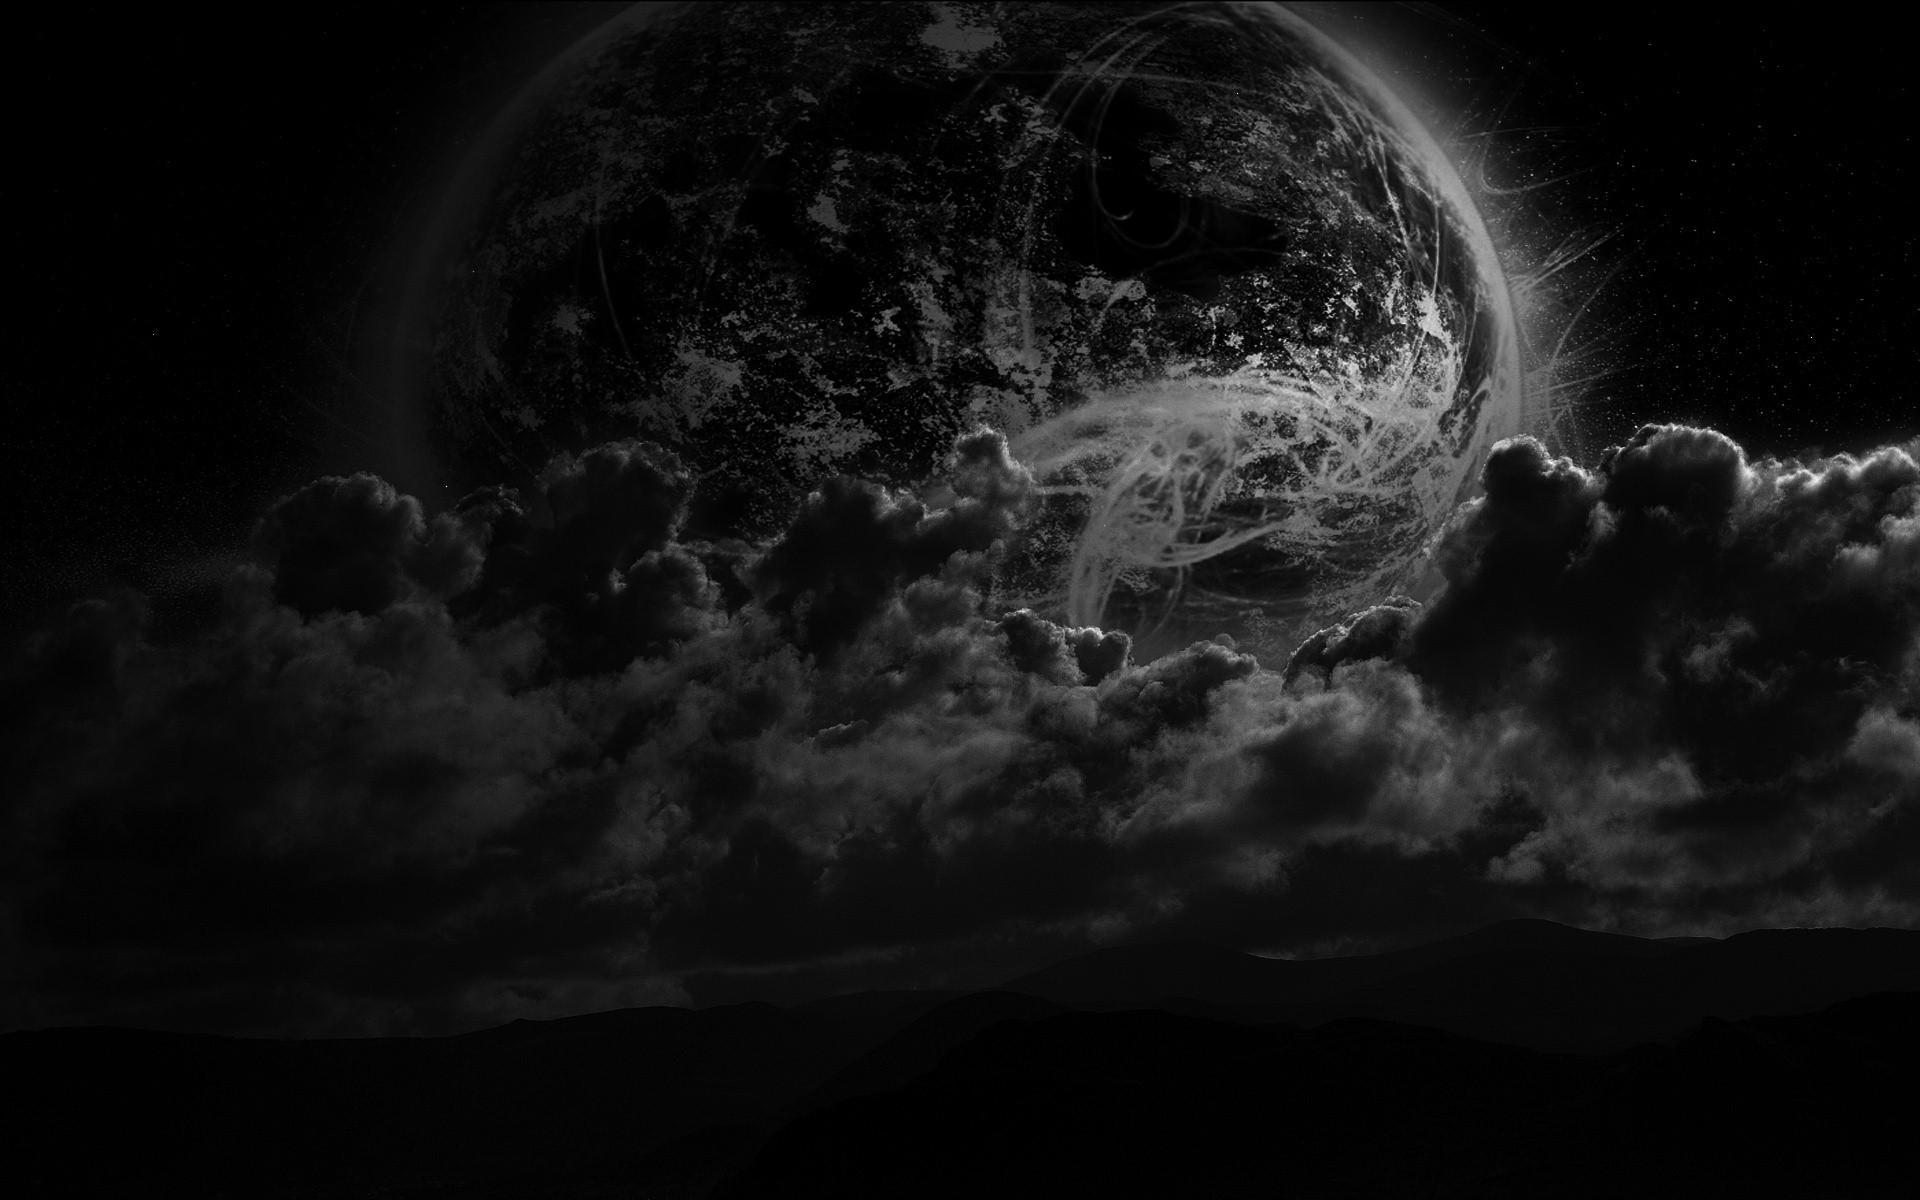 HD Darkness Background Free Wallpaper | Download Free - 140462